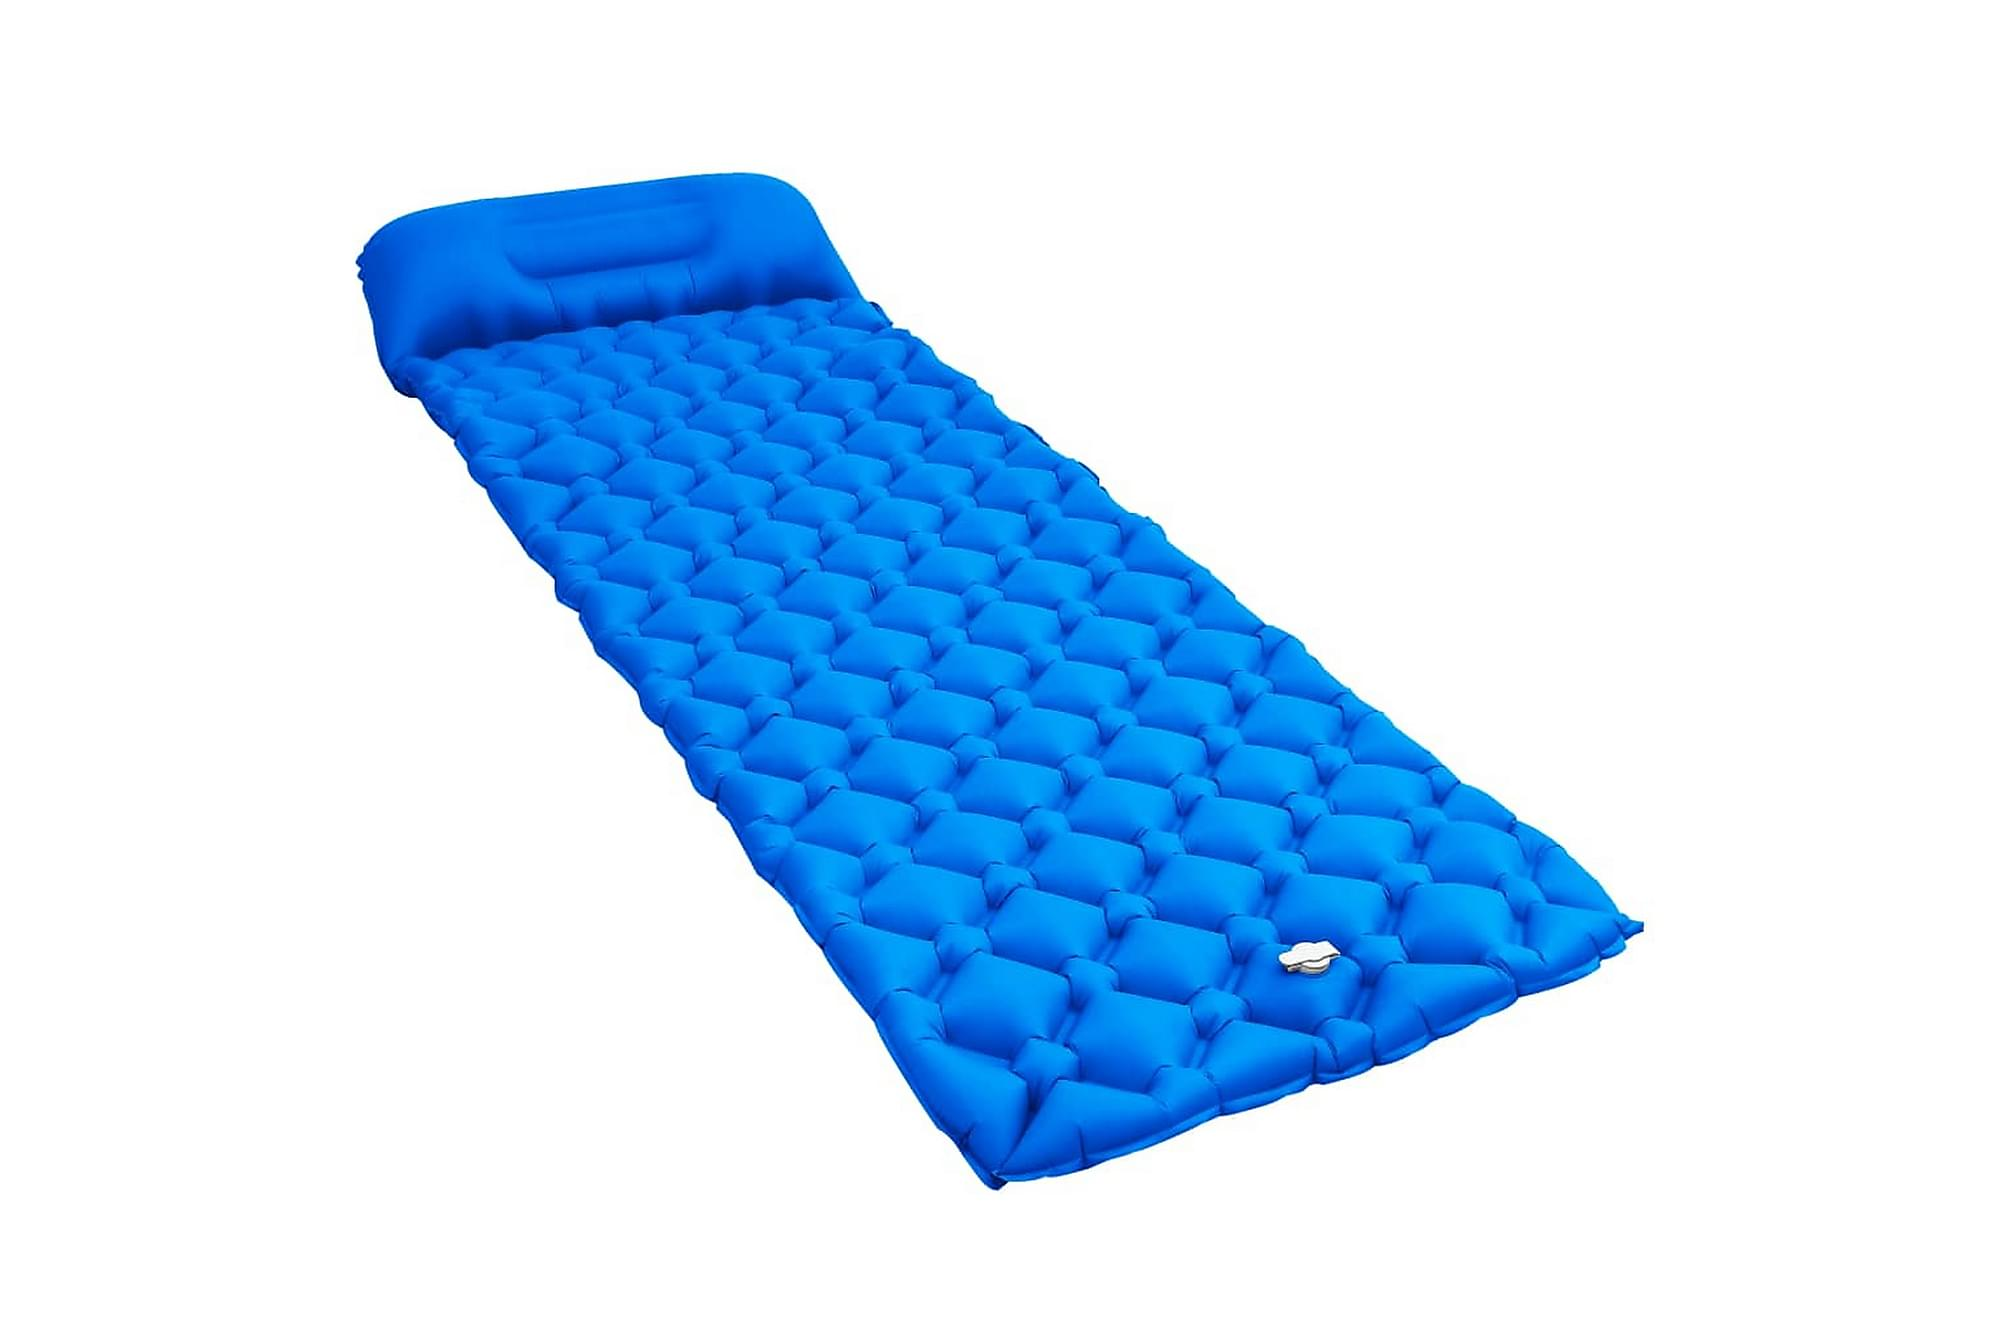 Luftmadrass med kudde 58x190 cm blå, Luftmadrasser & uppblåsbara madrass